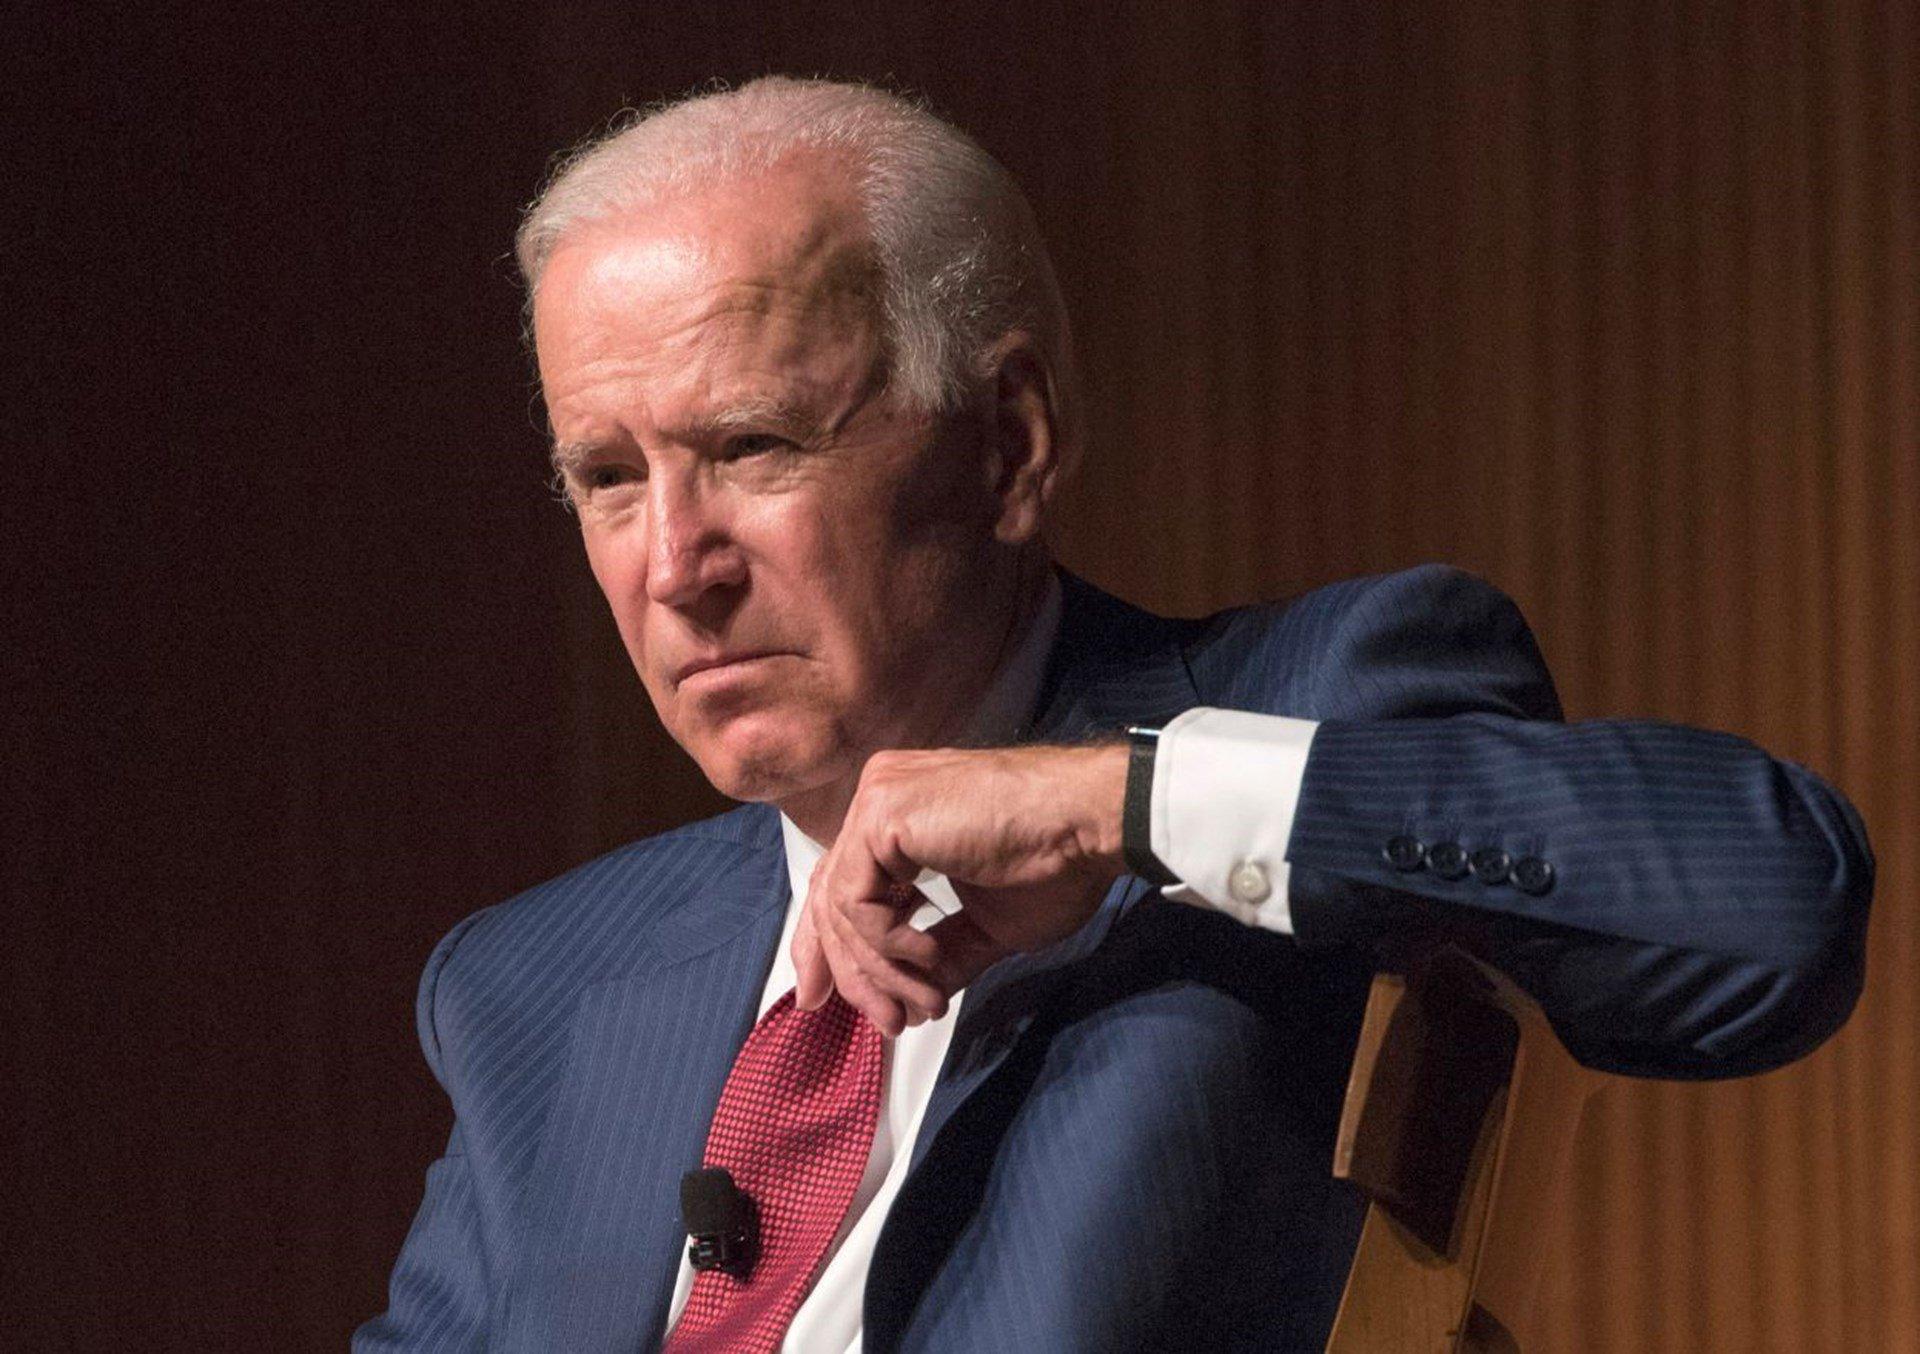 Photo of 2020 Presidential Hopeful Joe Biden: The Architect of America's Disastrous War on Drugs